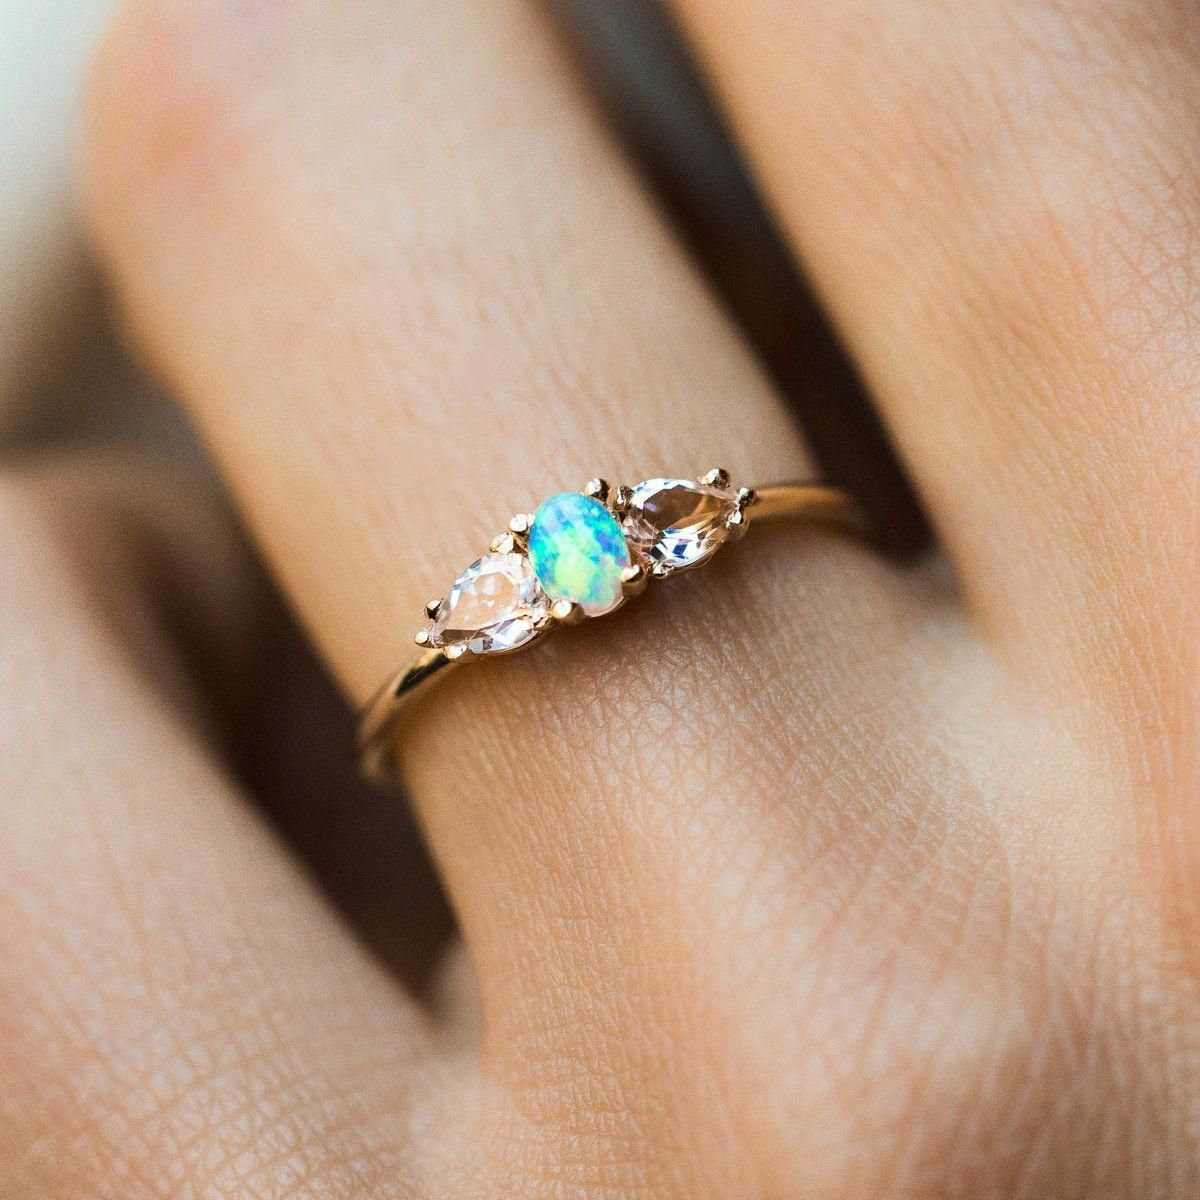 2CT Blue Sapphire Engagement Ring Set Floral Vintage